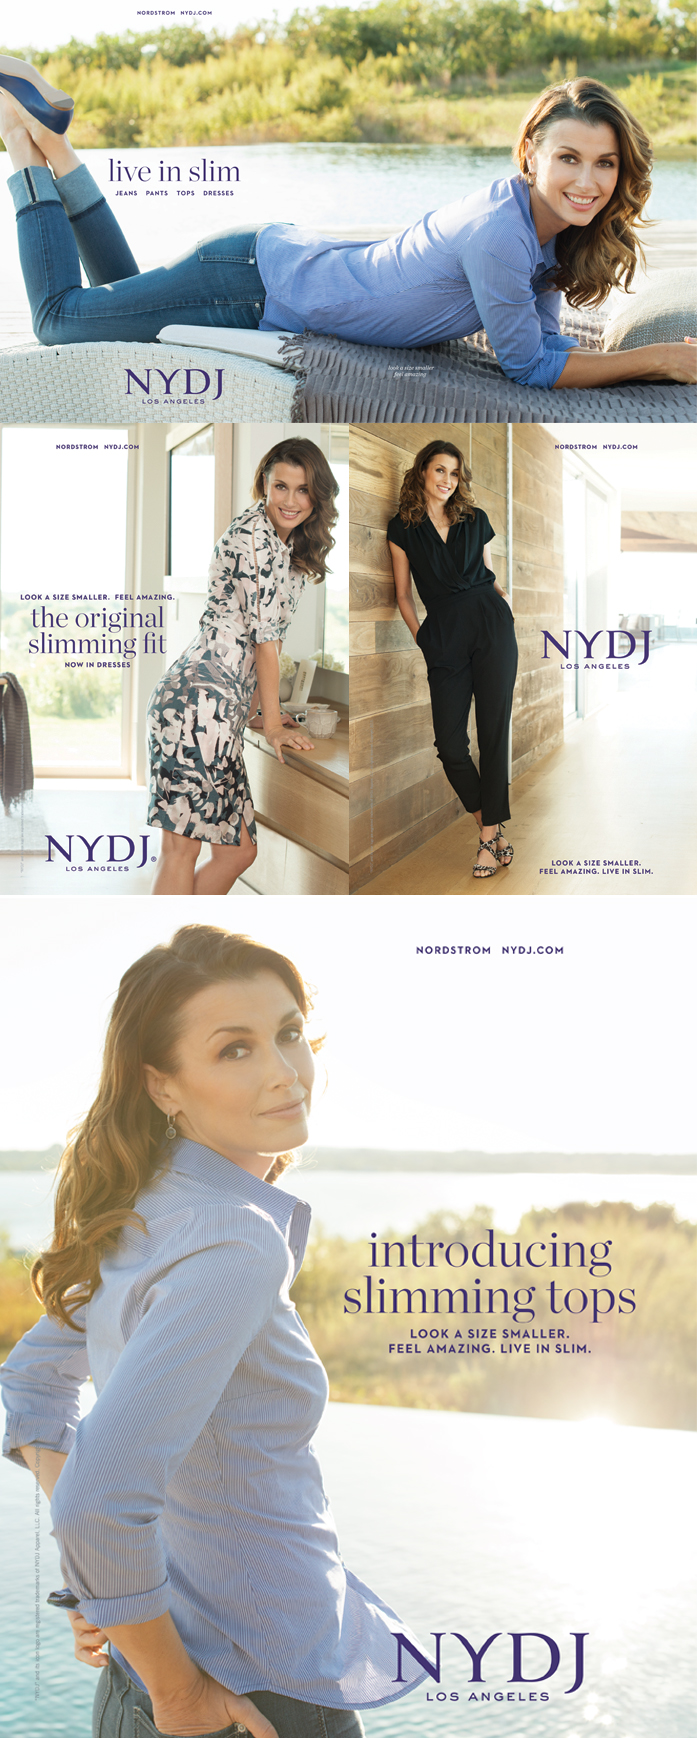 NYDJ_web